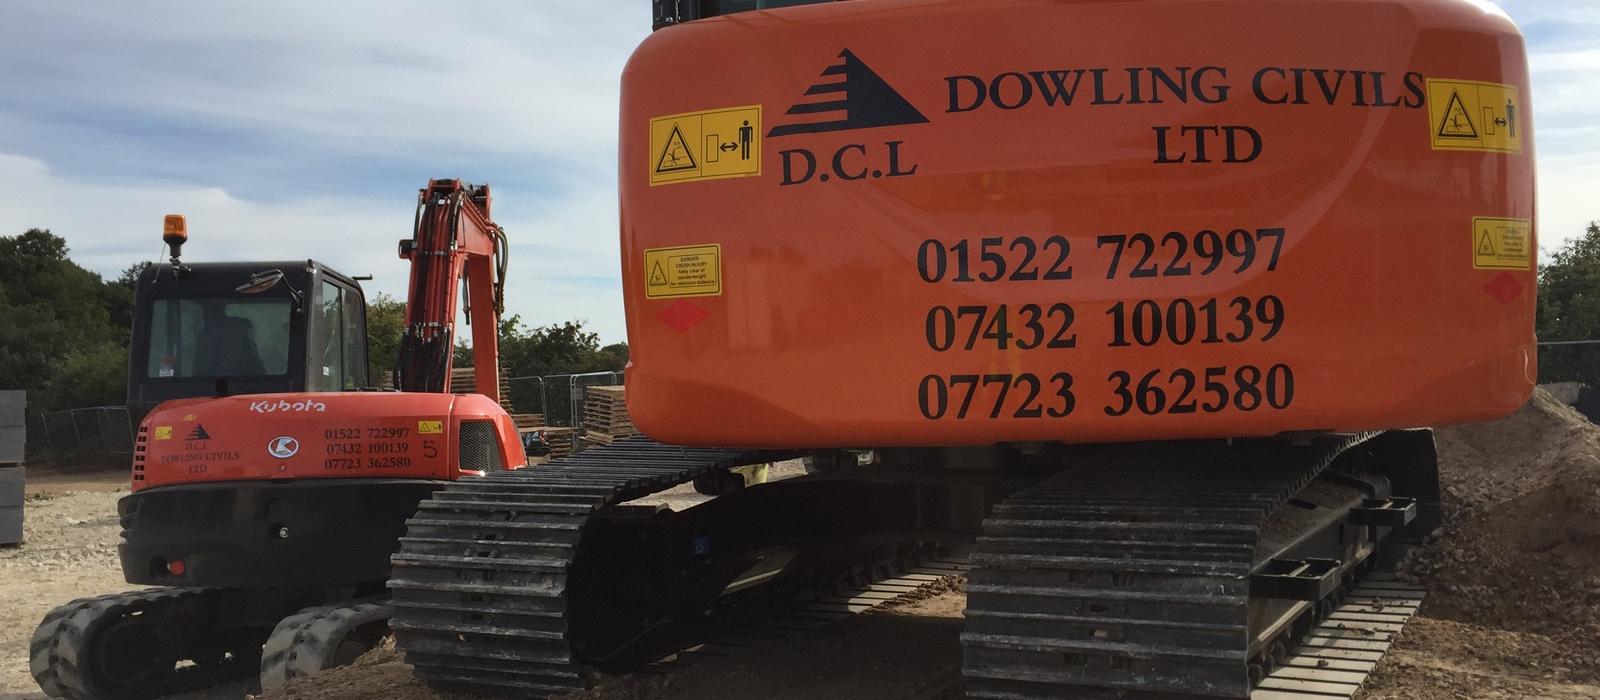 Civil Engineers Lincolnshire - Dowling Civil Engineering Ltd